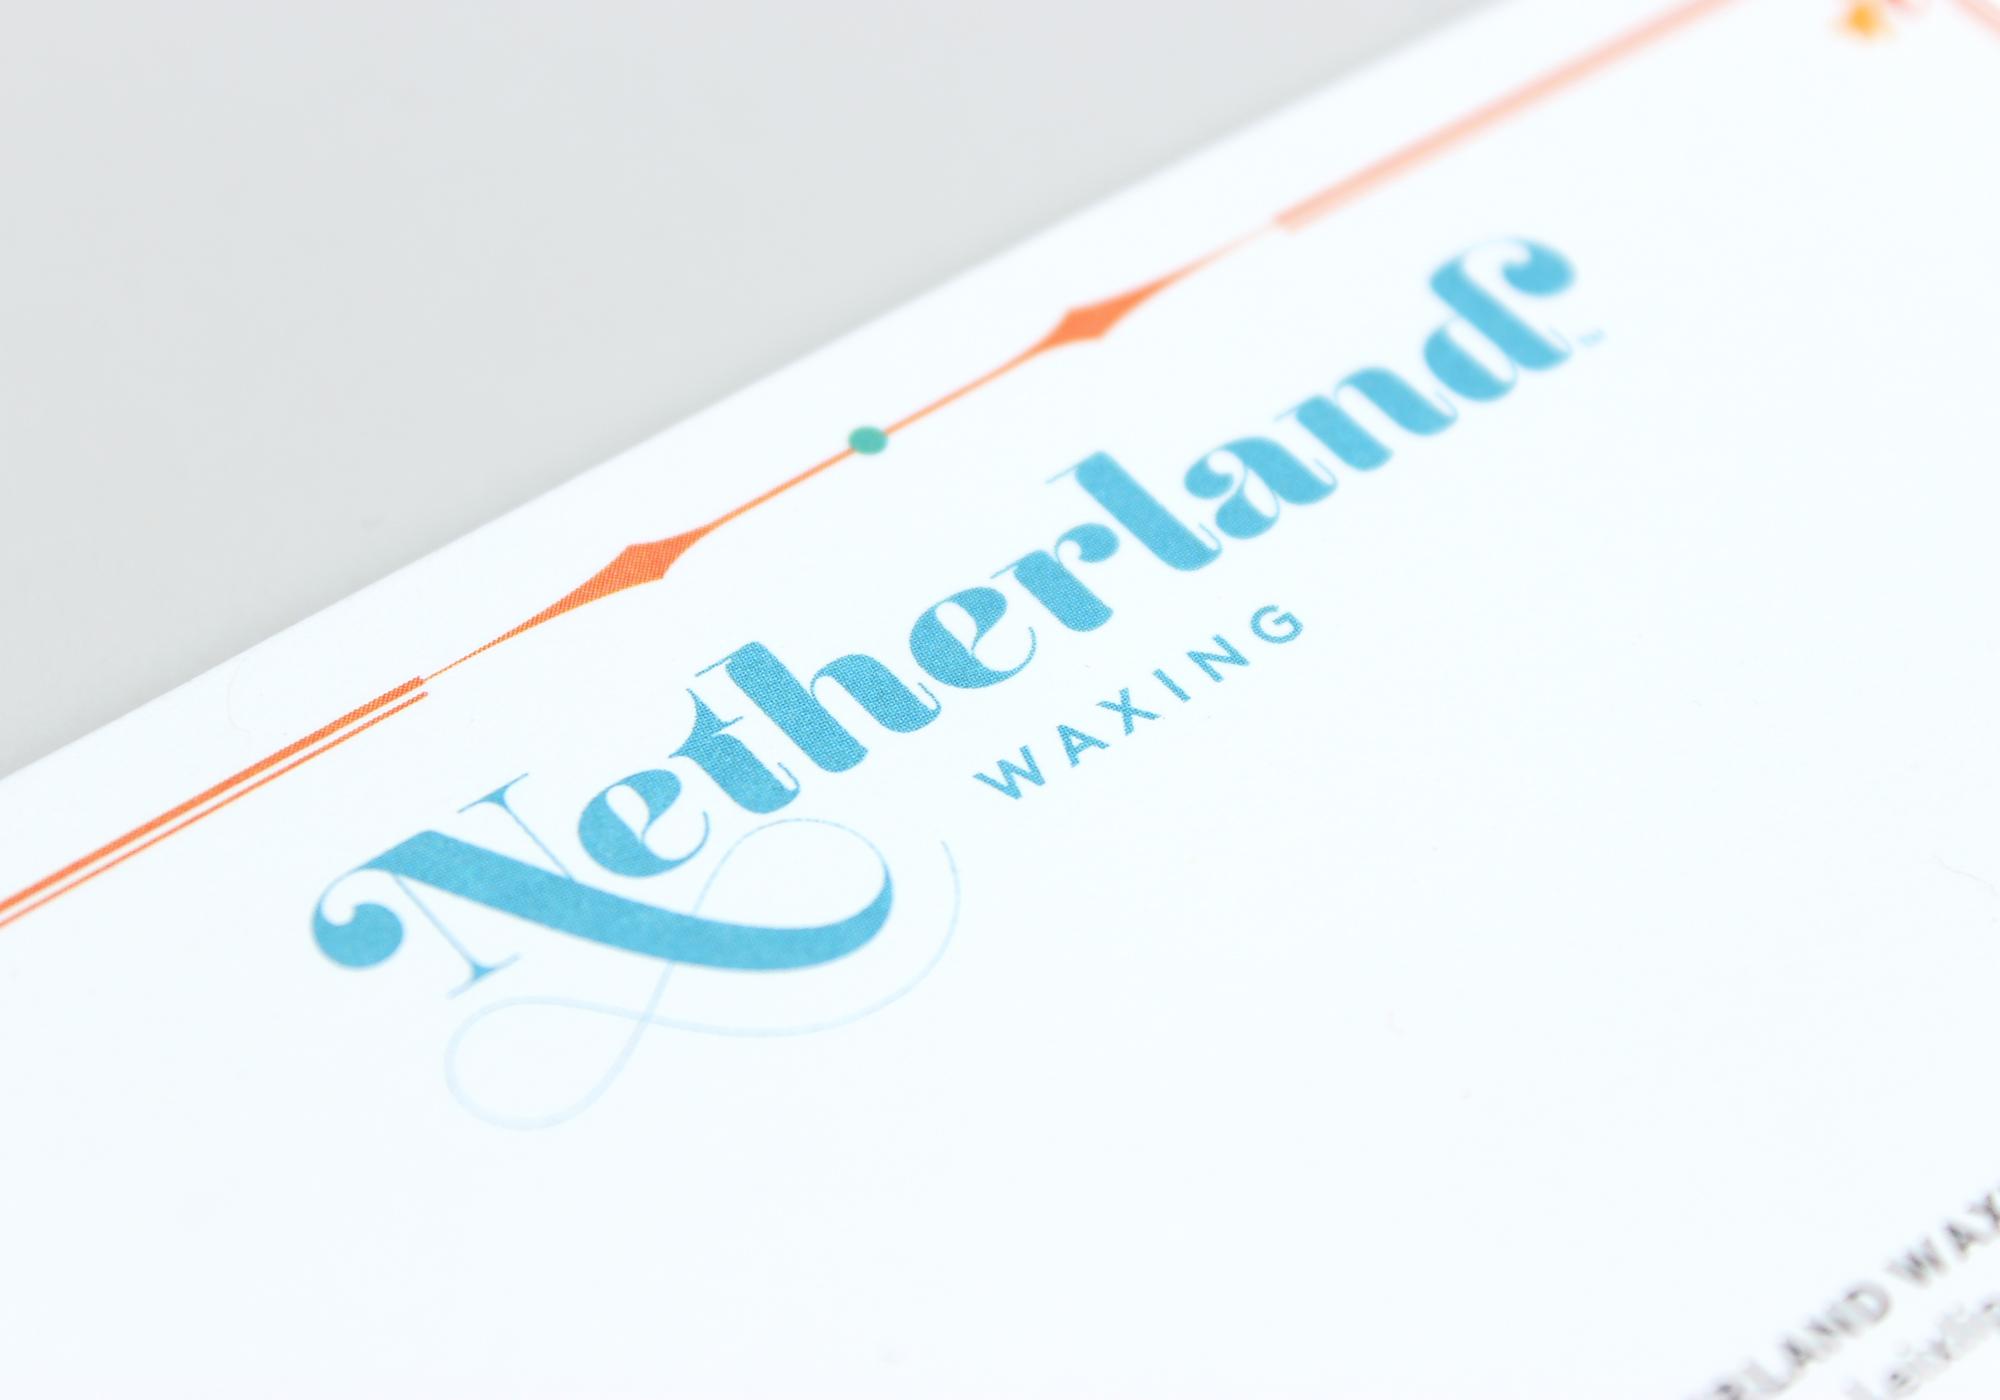 Cover image: Netherland